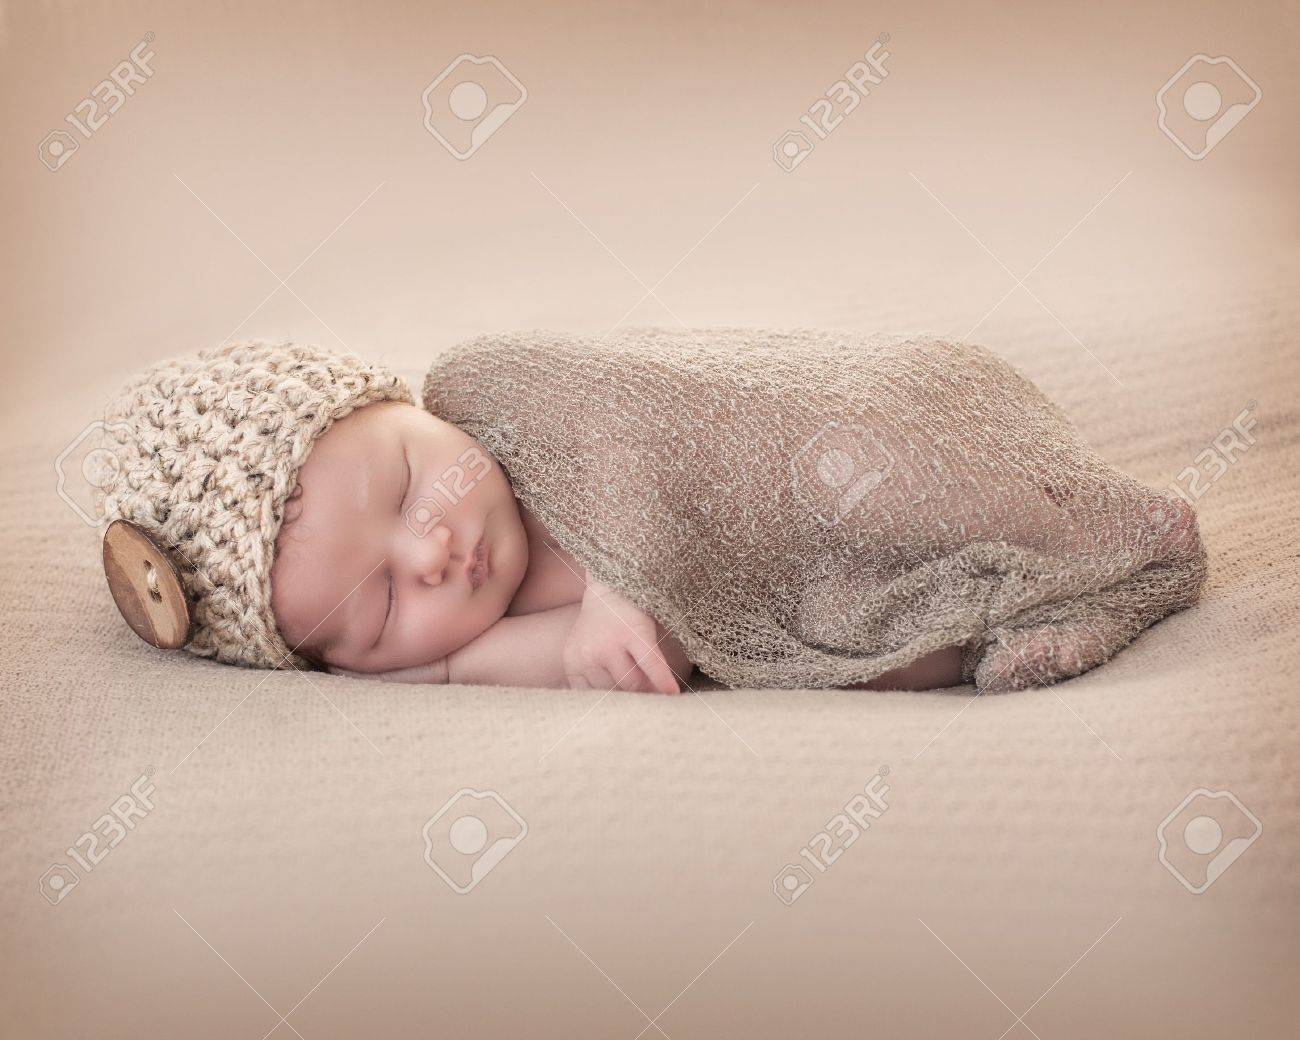 Newborn with Beany - 20673028